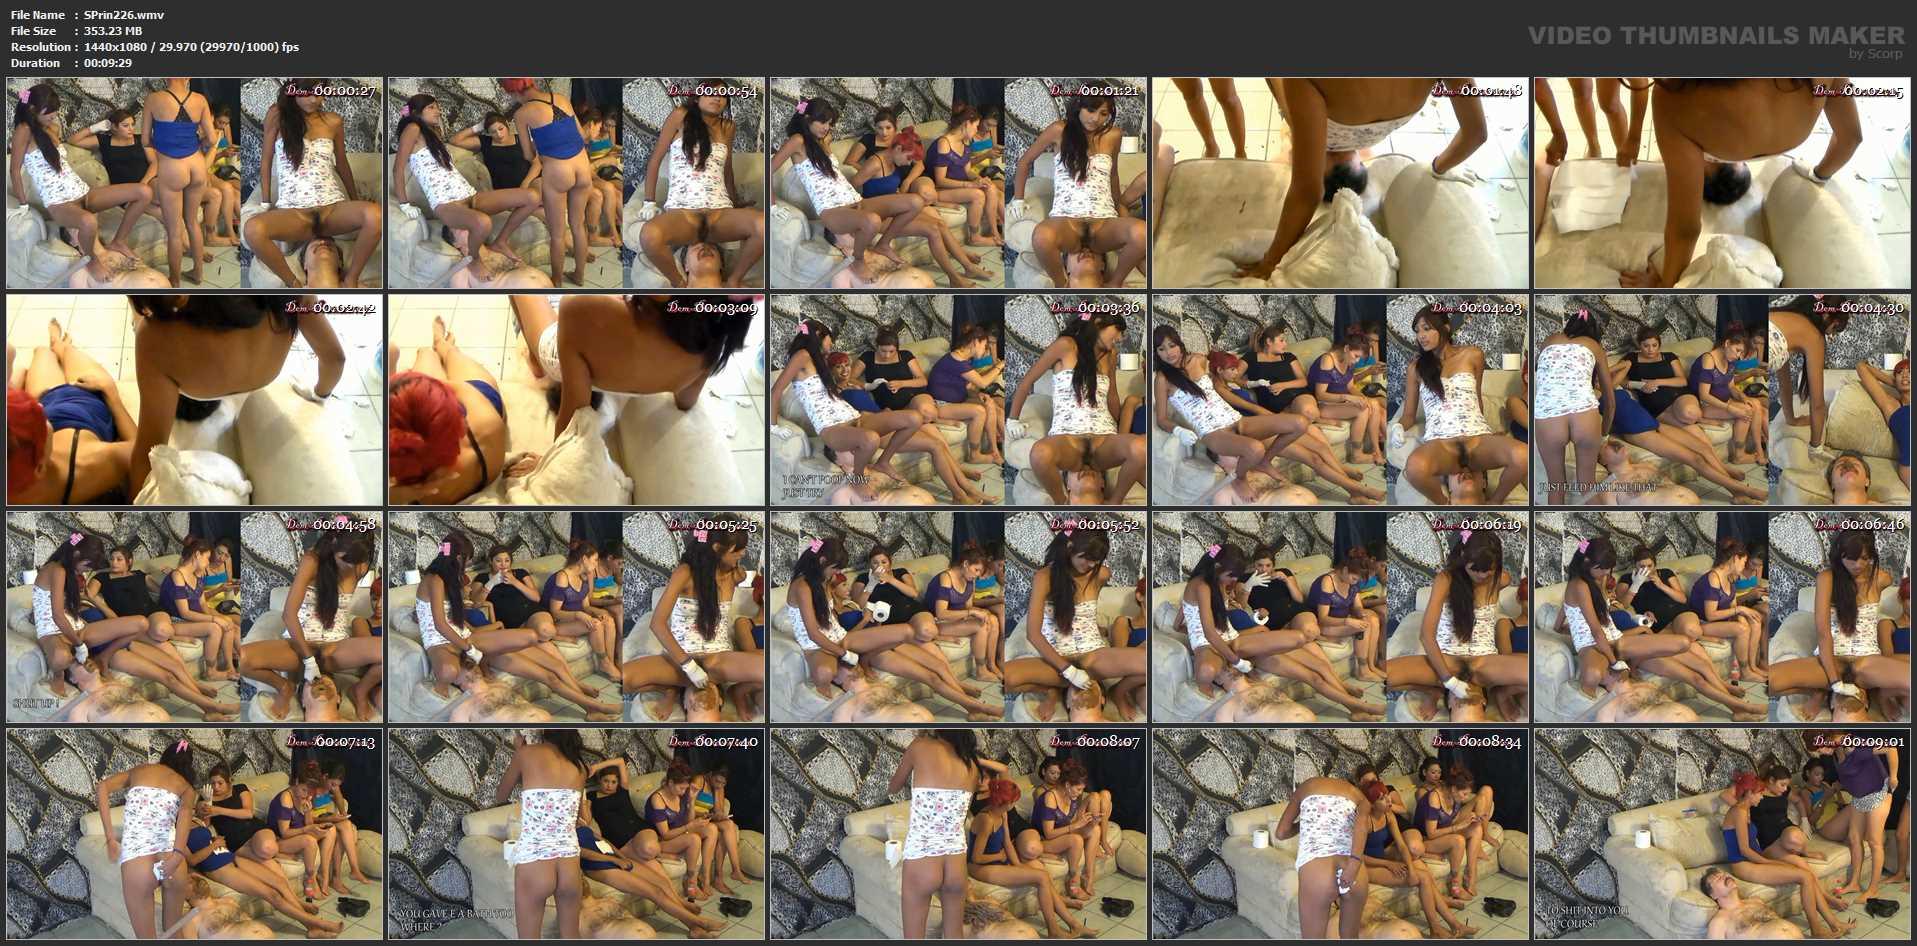 [SCAT-PRINCESS] On Couch Toilet Session Part 3 Carmen [FULL HD][1080p][WMV]